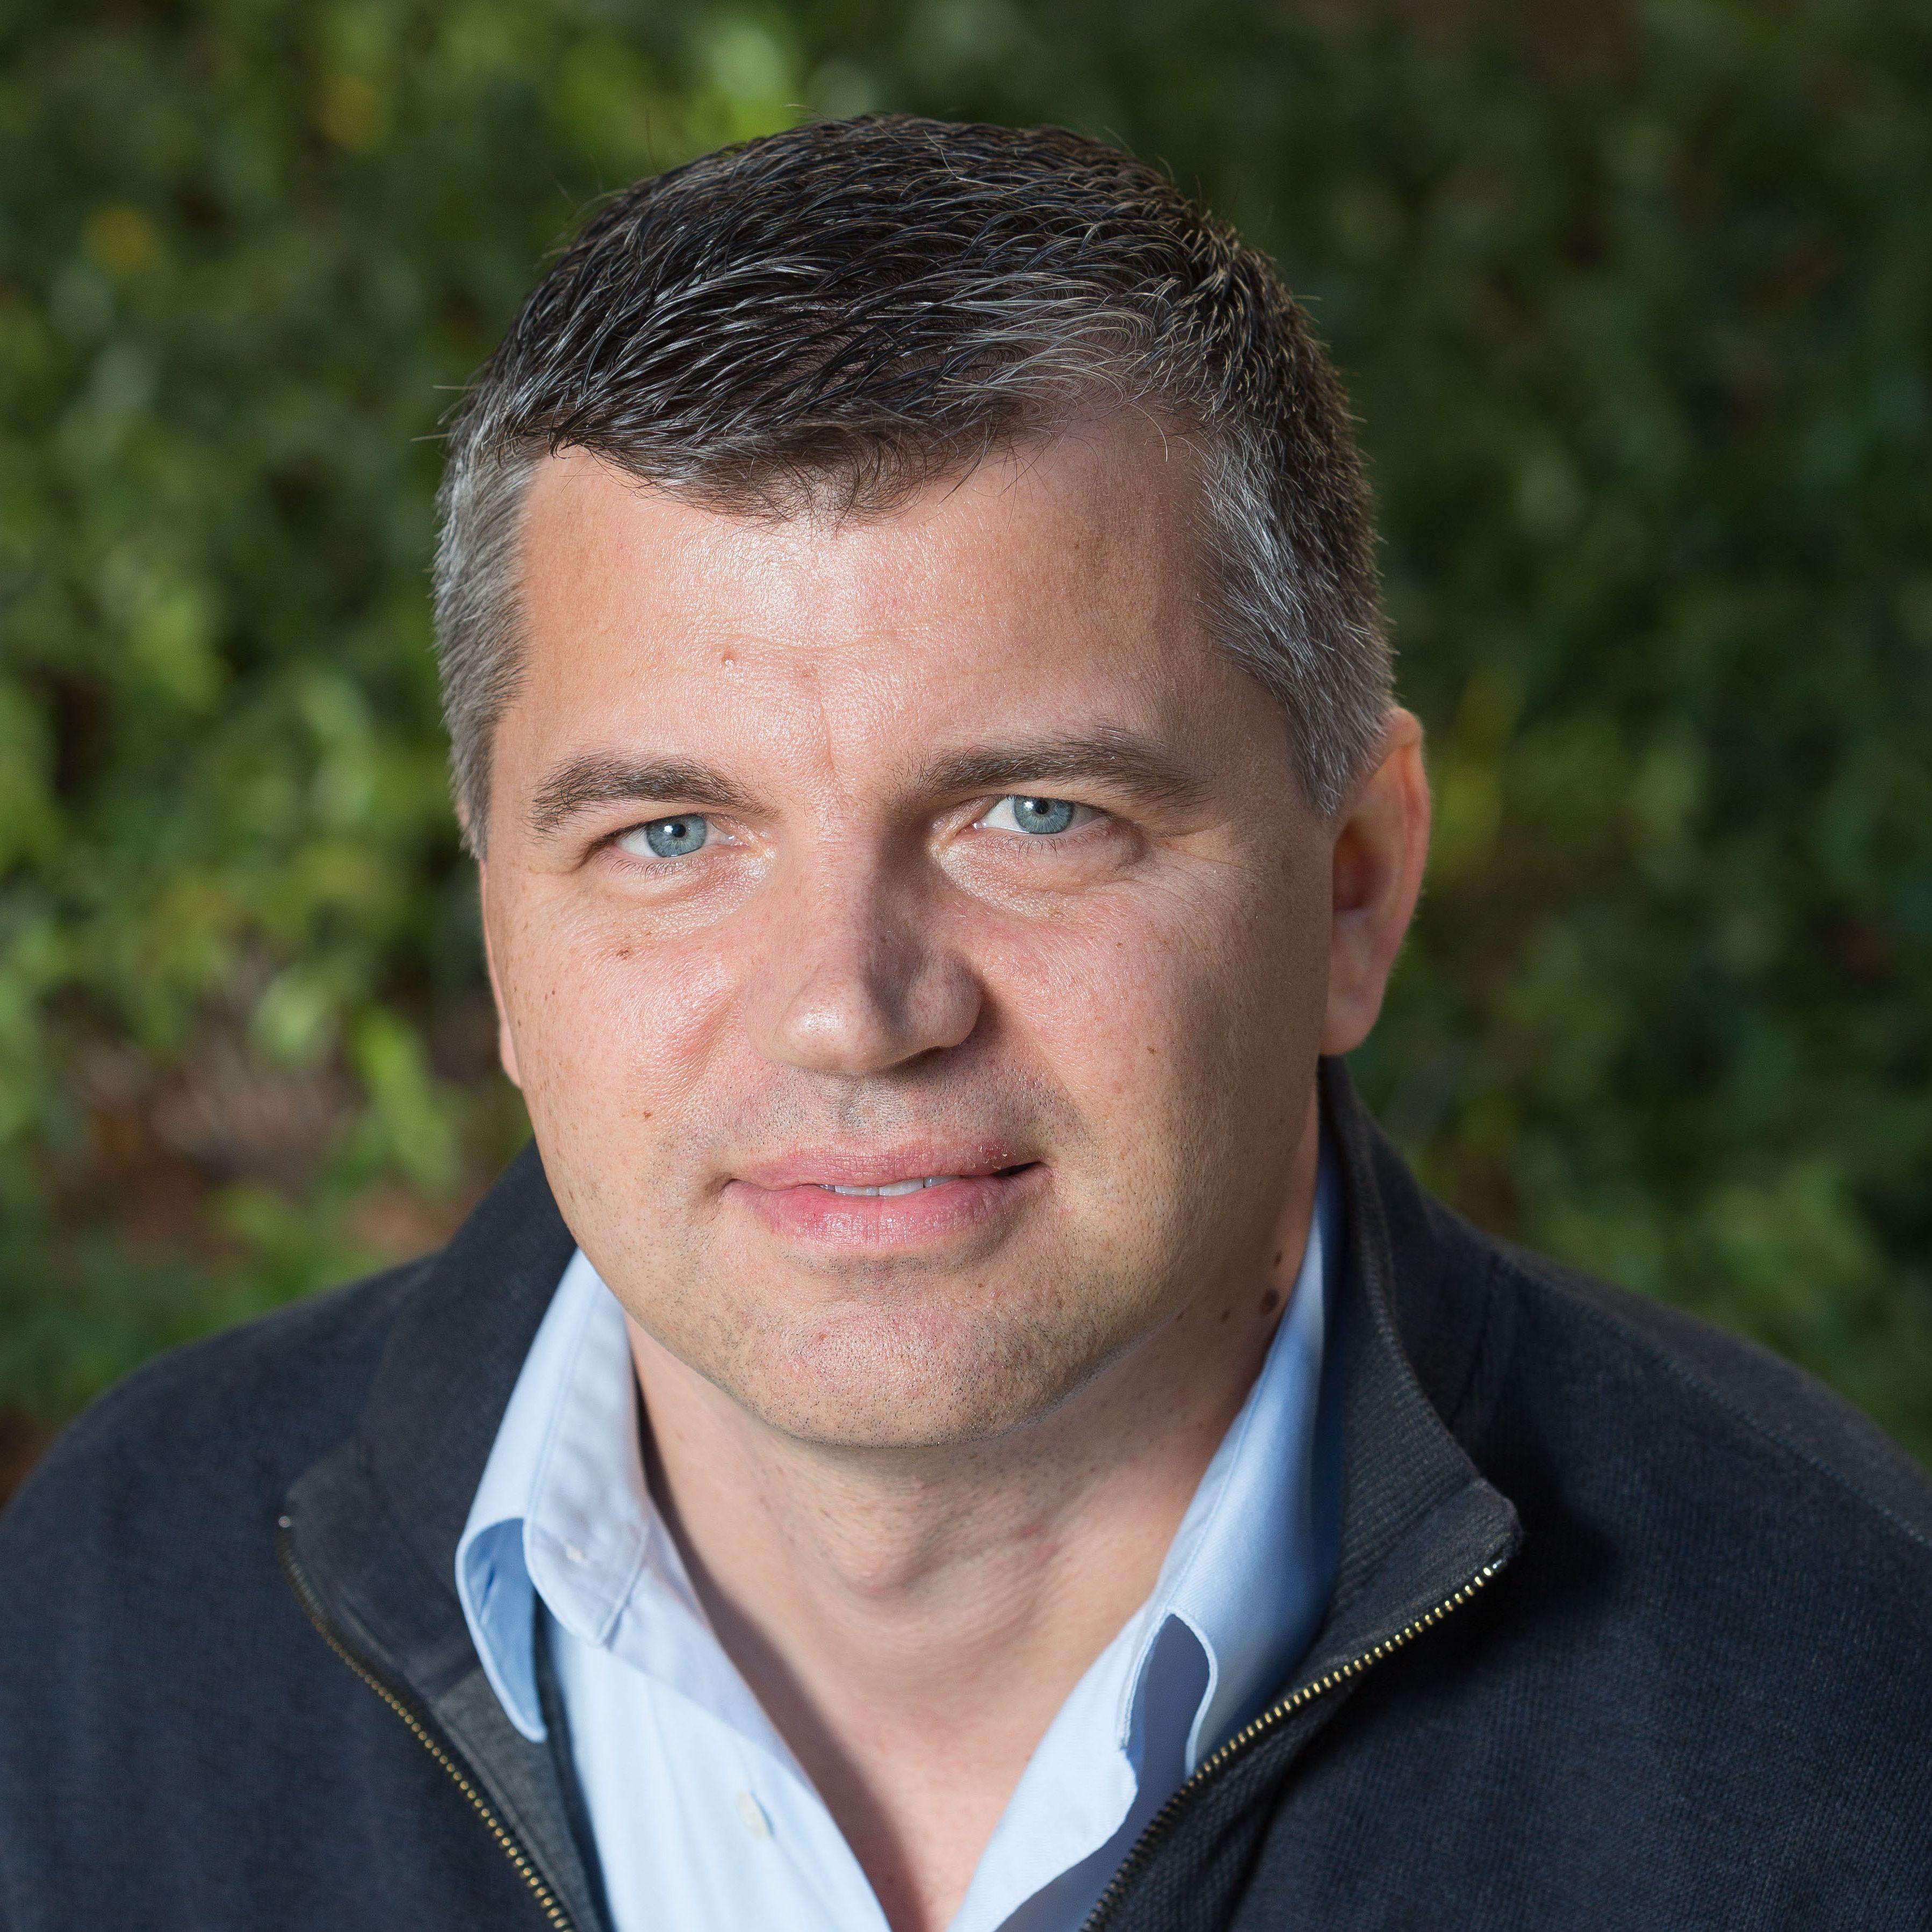 Michael Soltys-Kulinicz